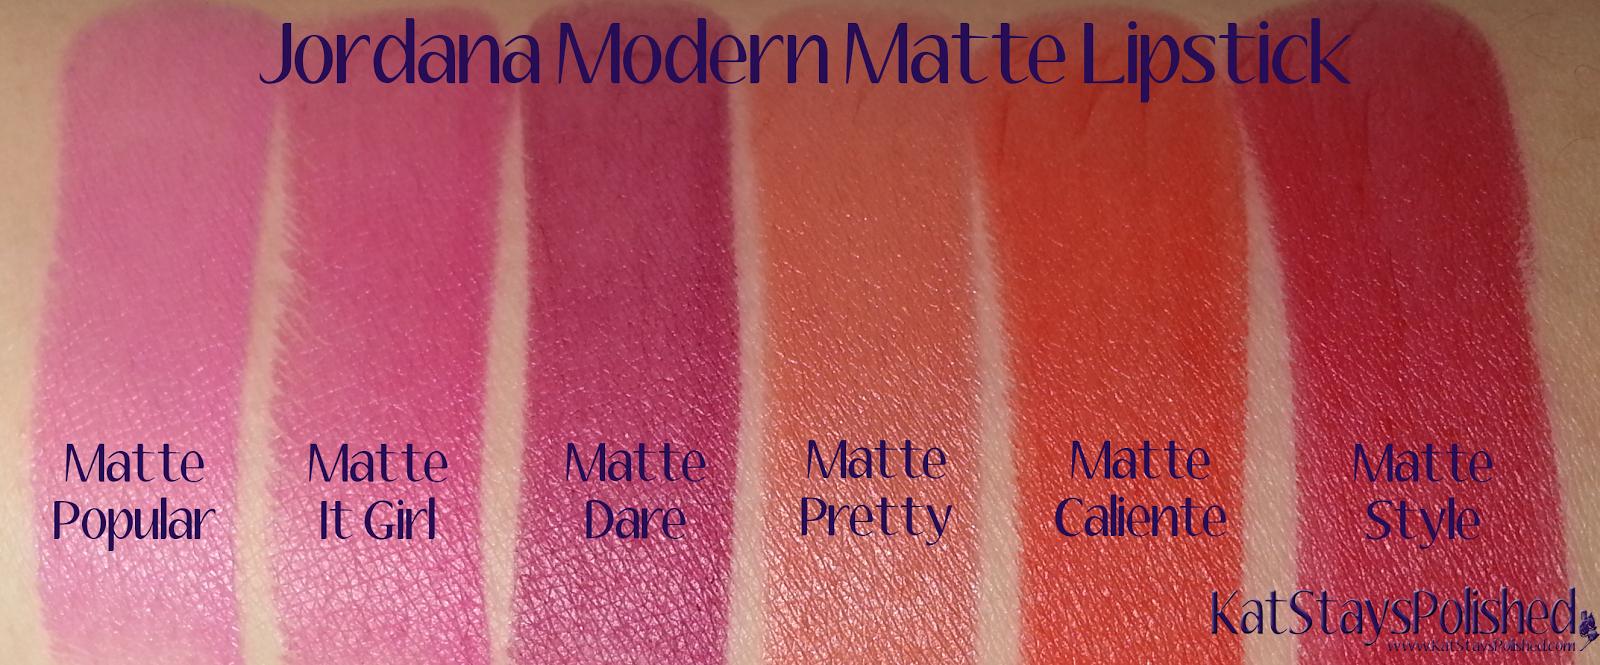 Jordana Modern Matte Lipstick | Kat Stays Polished